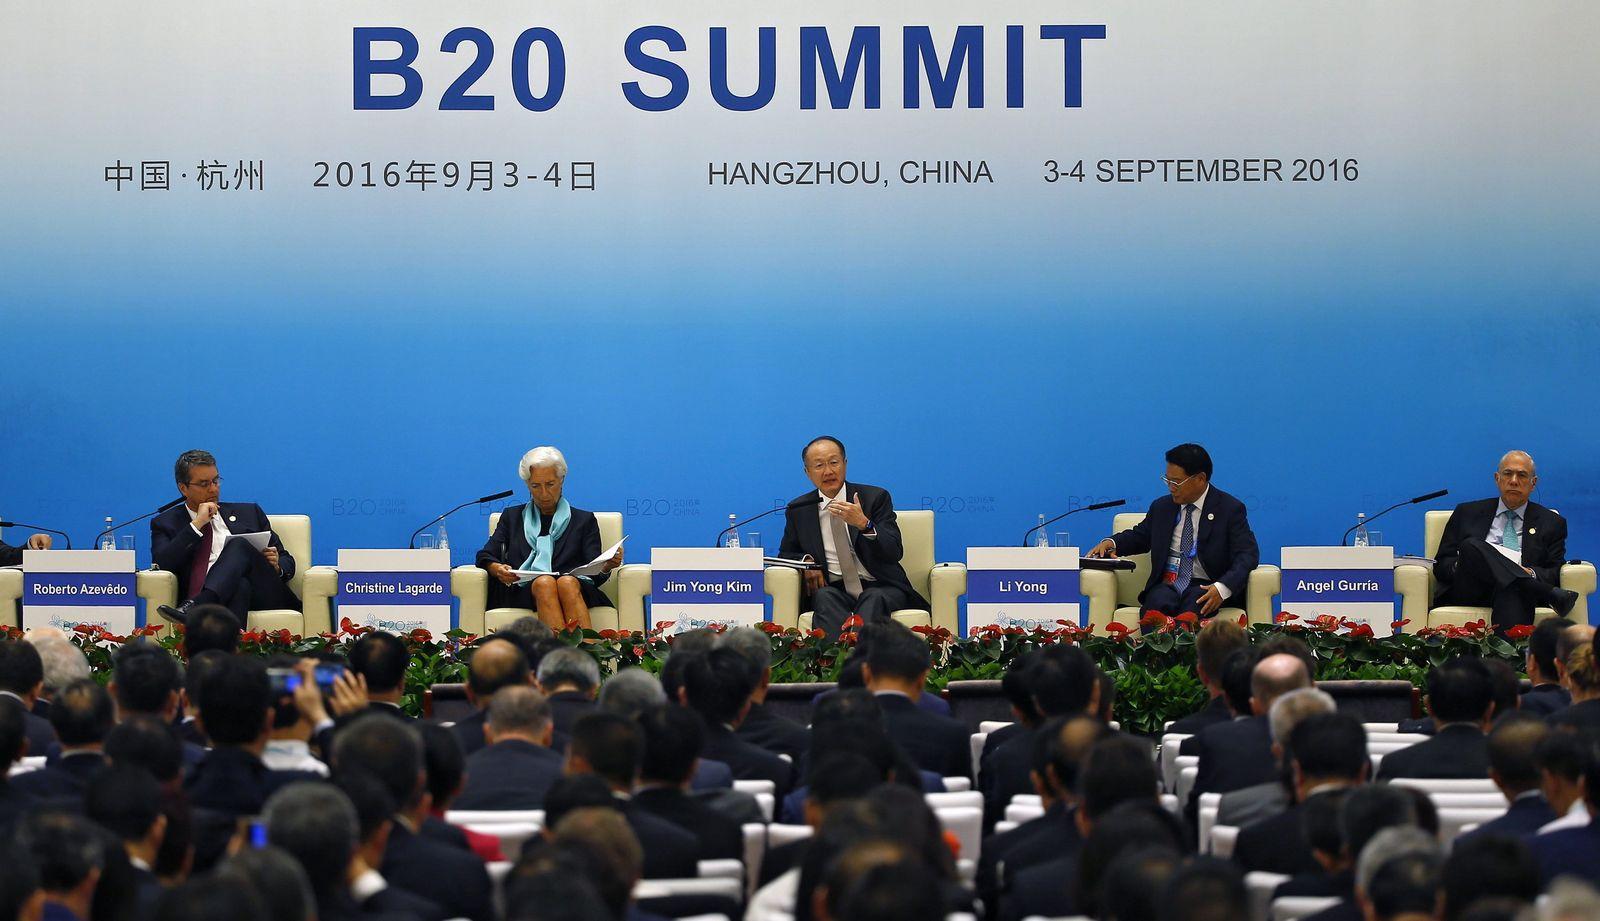 China G20 Hangzhou Summit 2016 - B20